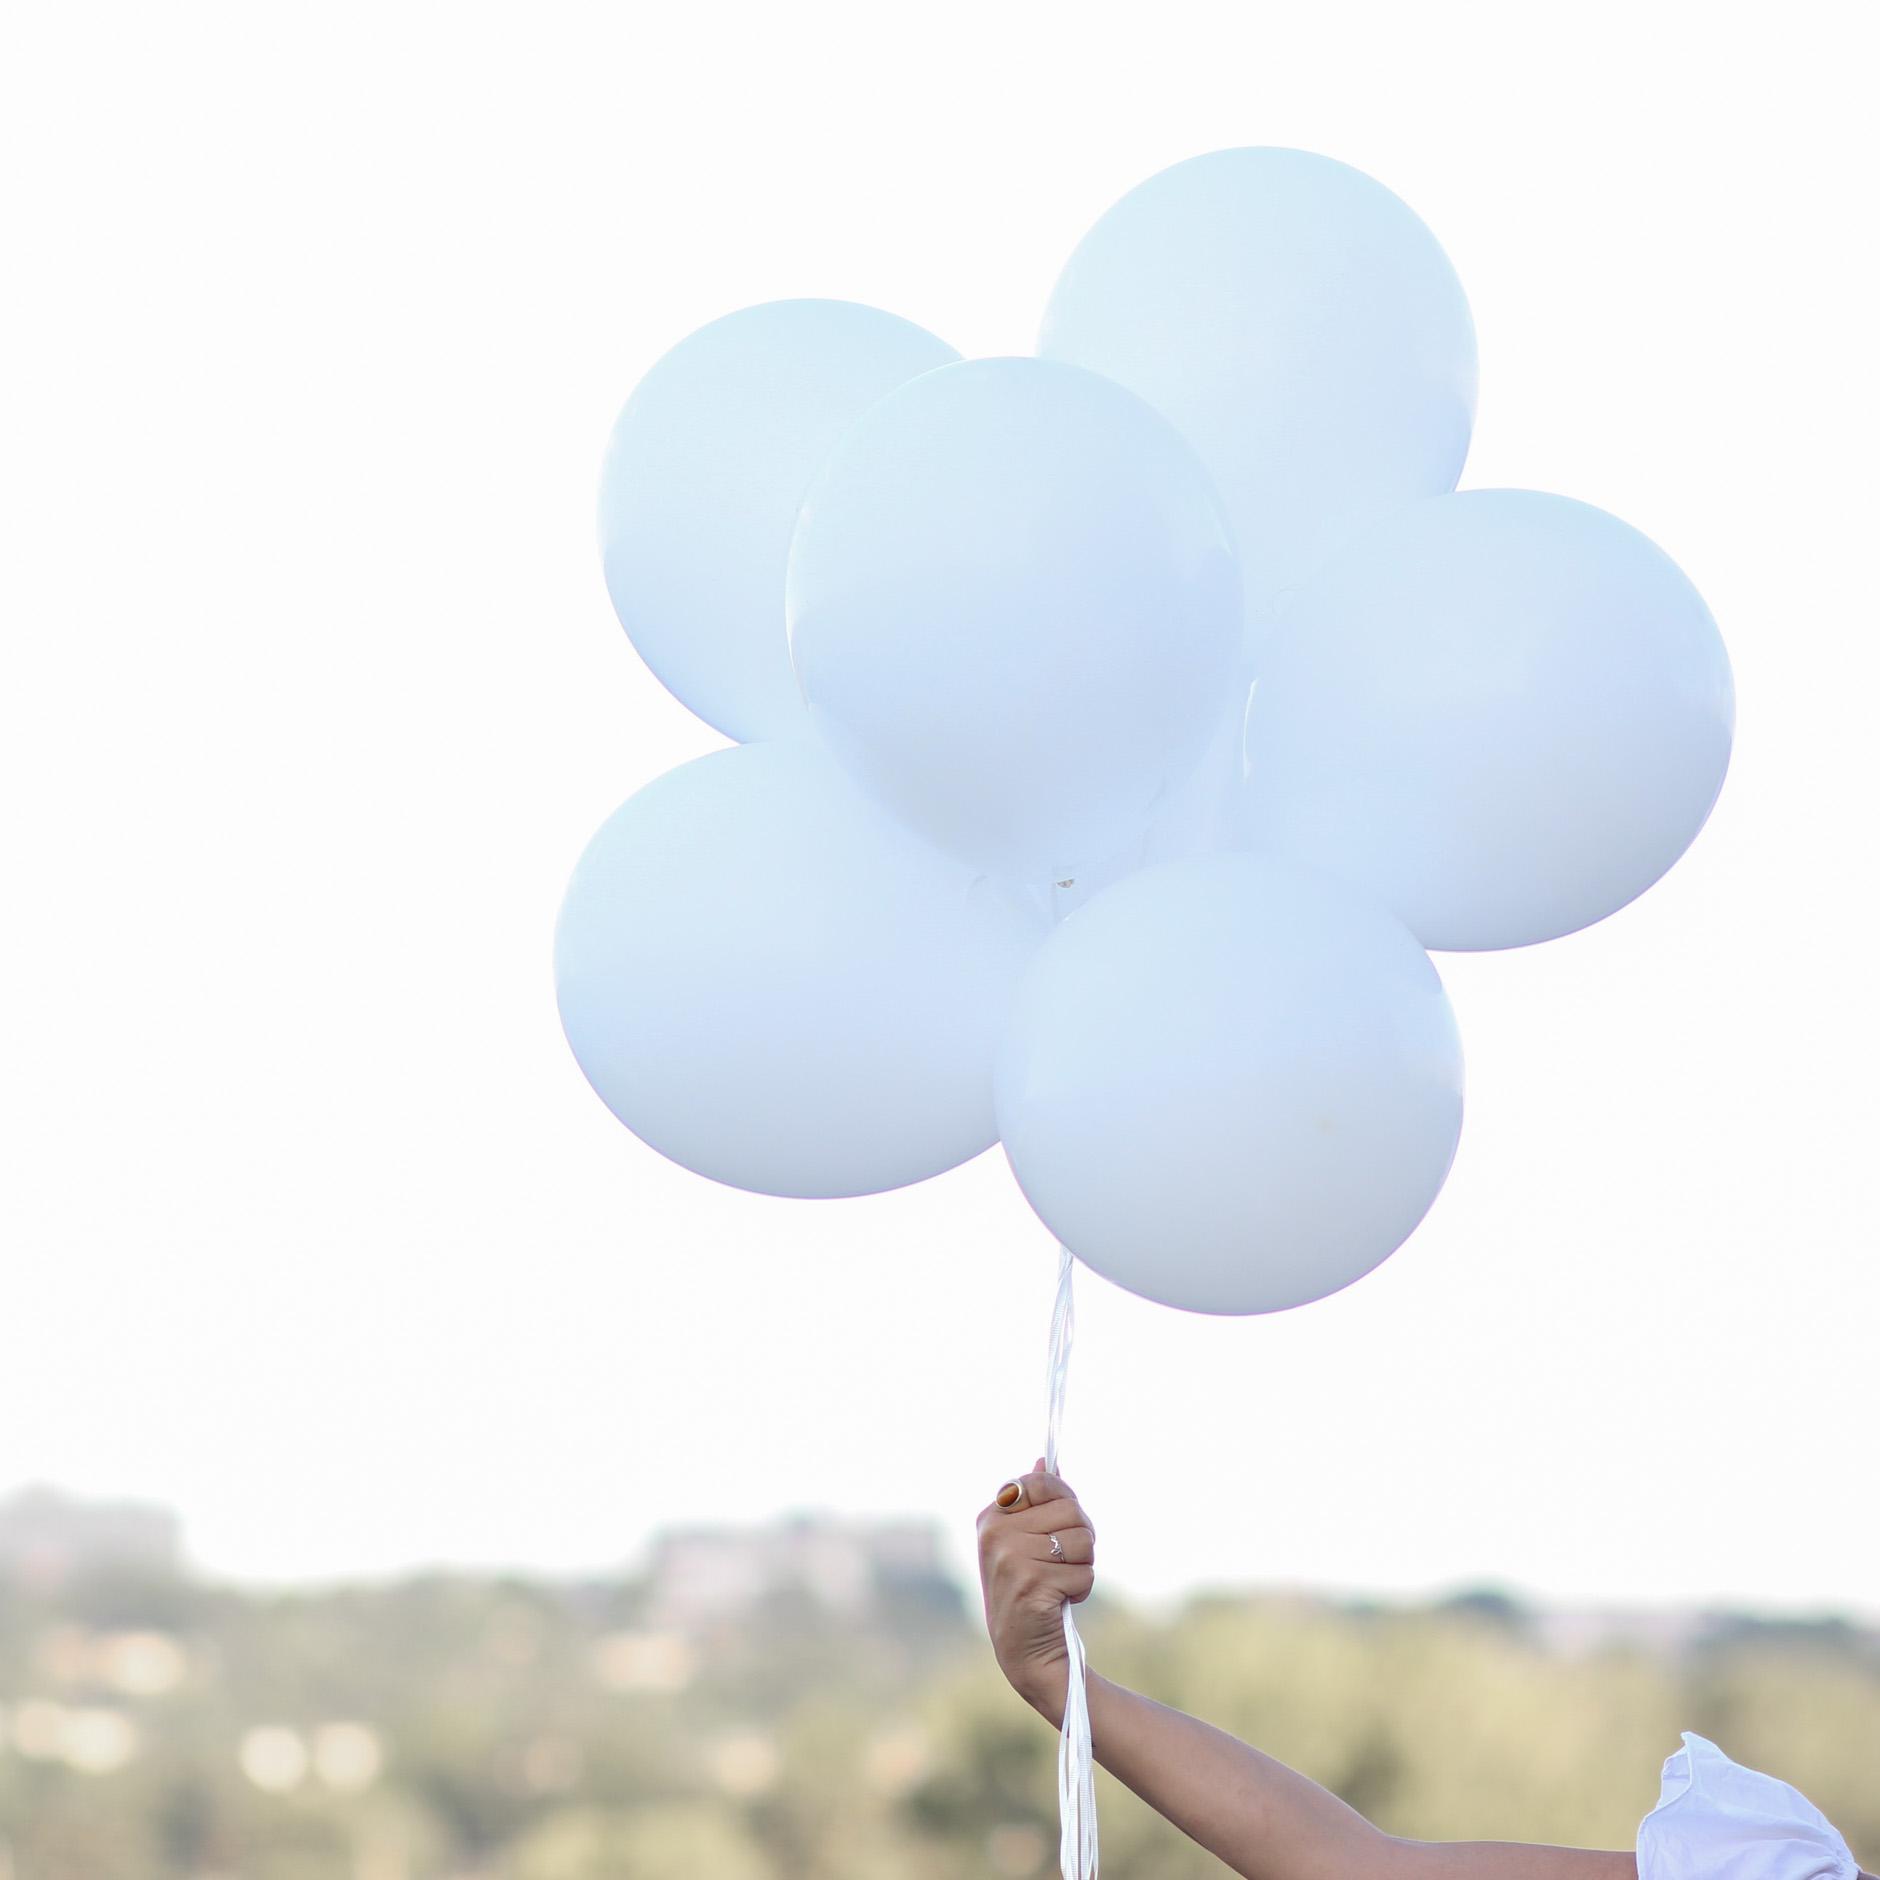 lifestyle blogger naty michele holding white balloons